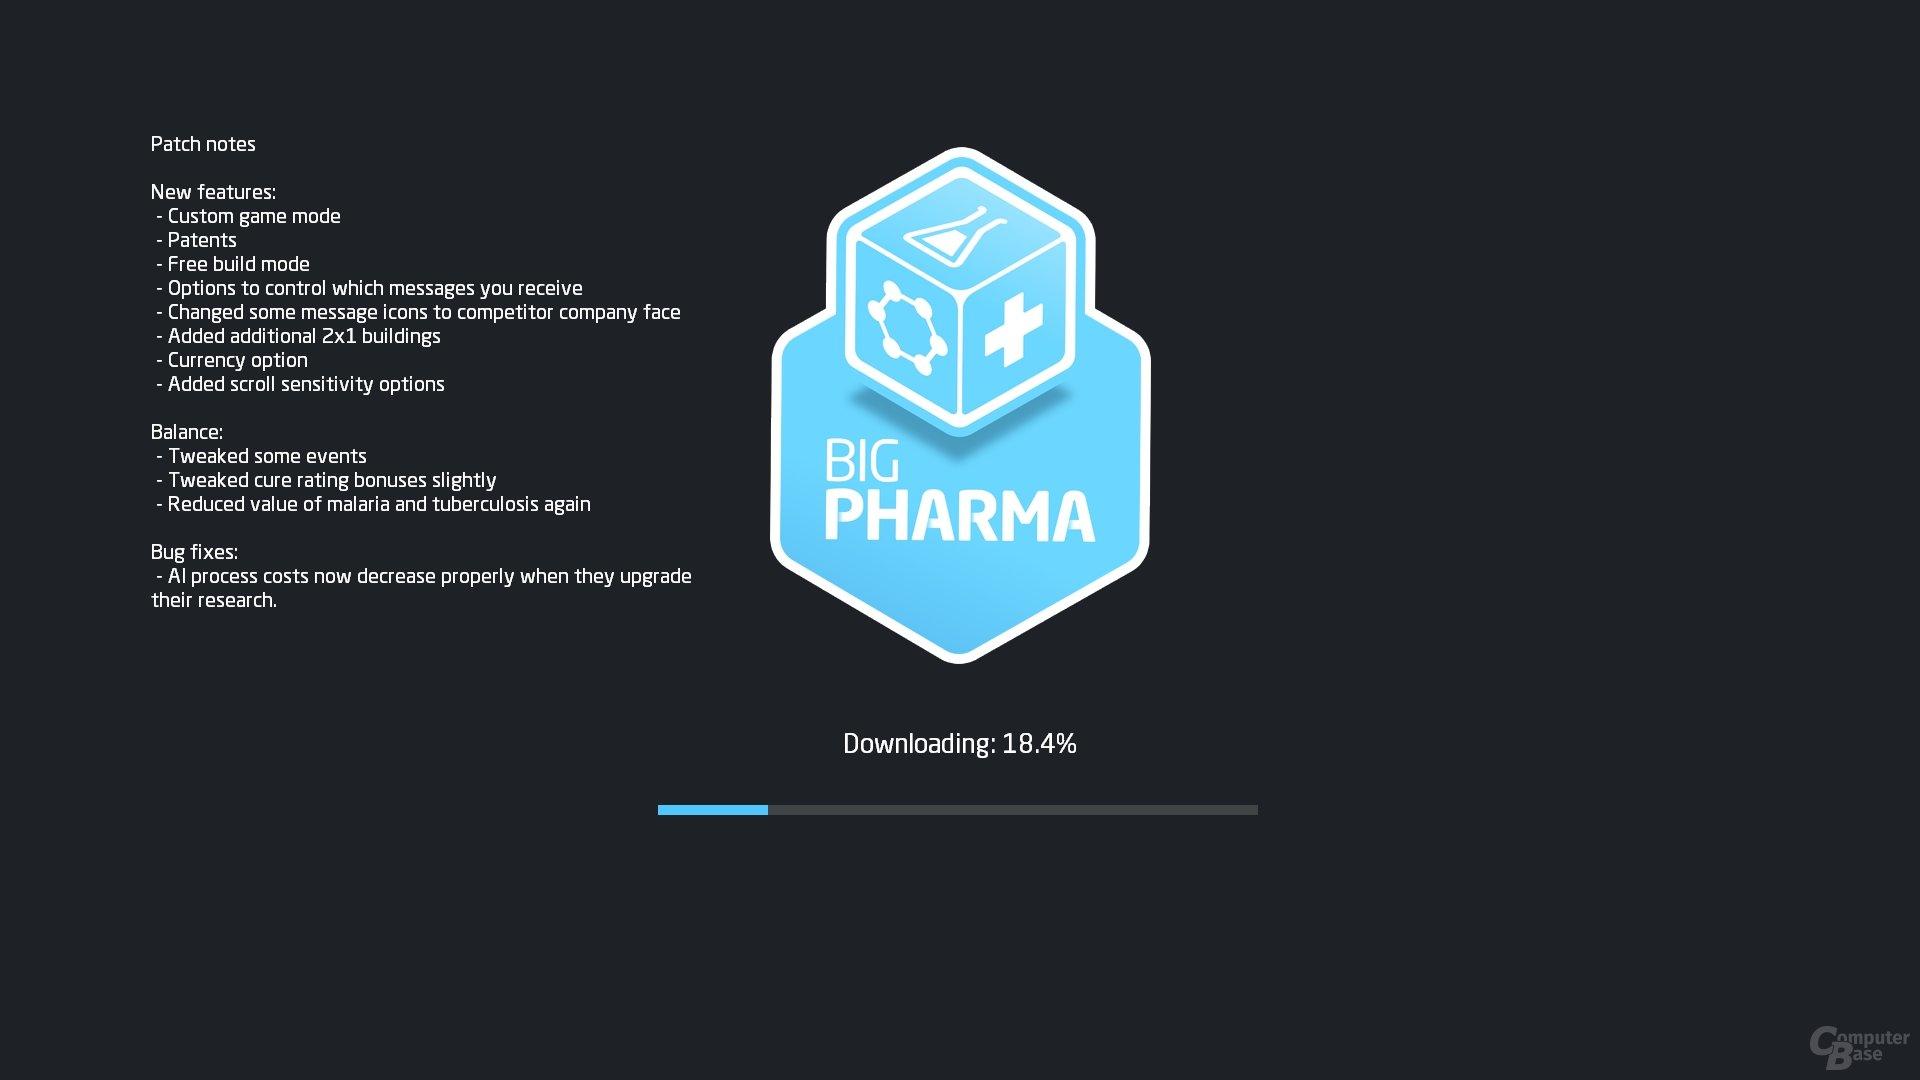 Big Pharma im Test